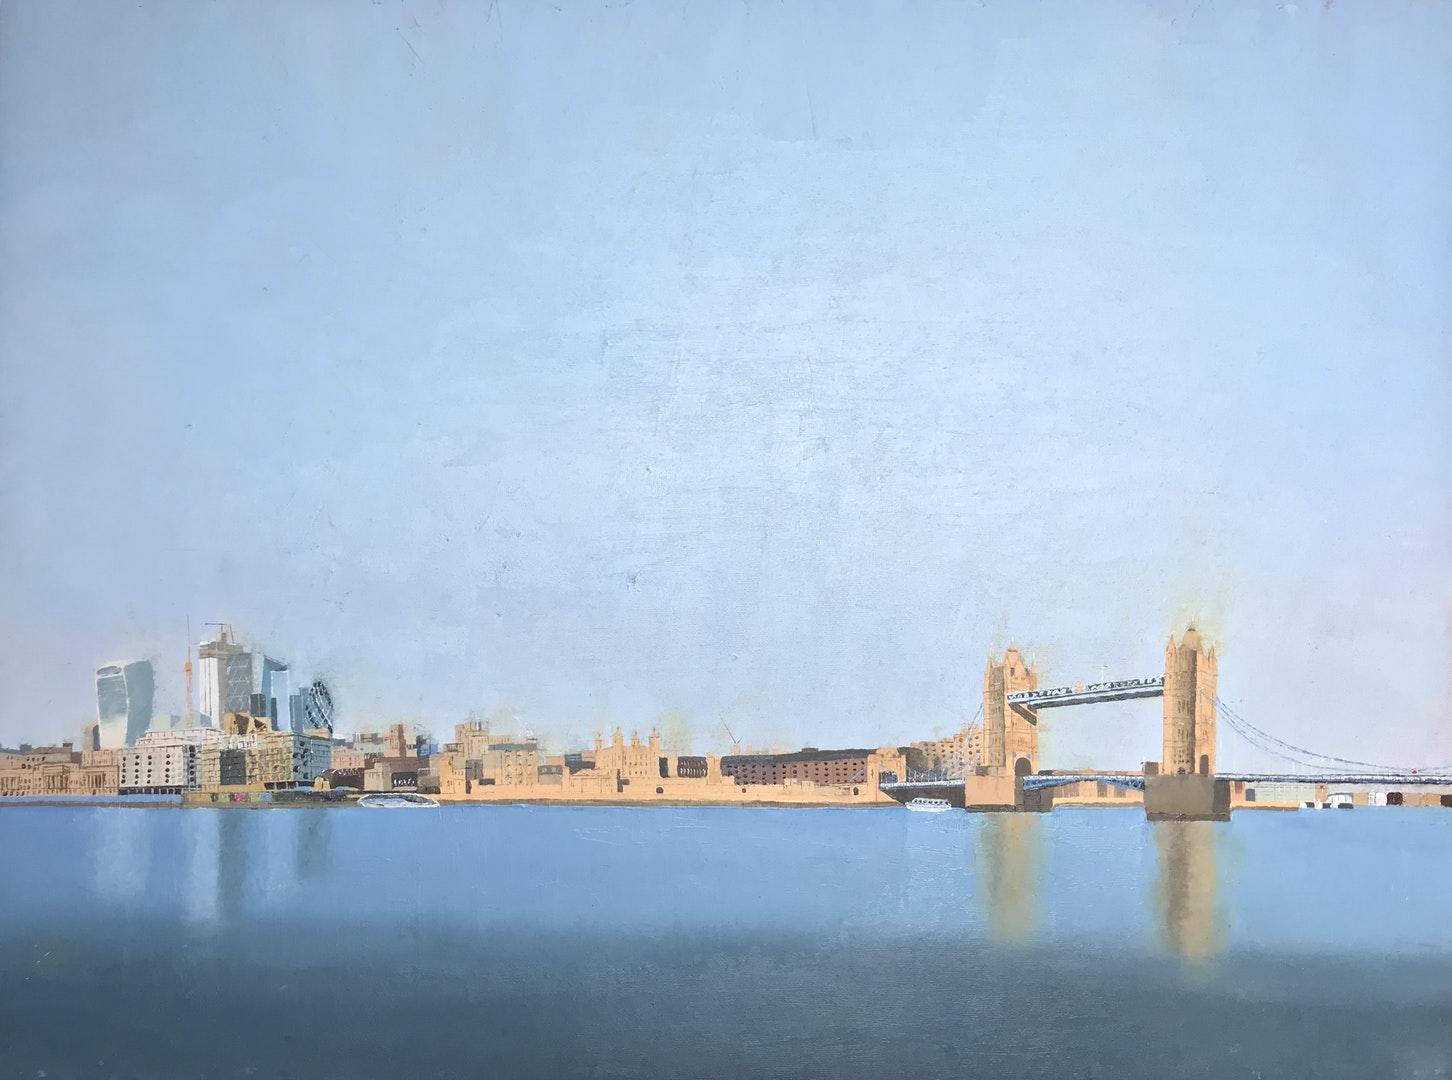 'View from Queens Walk', Kieran Luke Naish, Oil, 57 x 72 cm